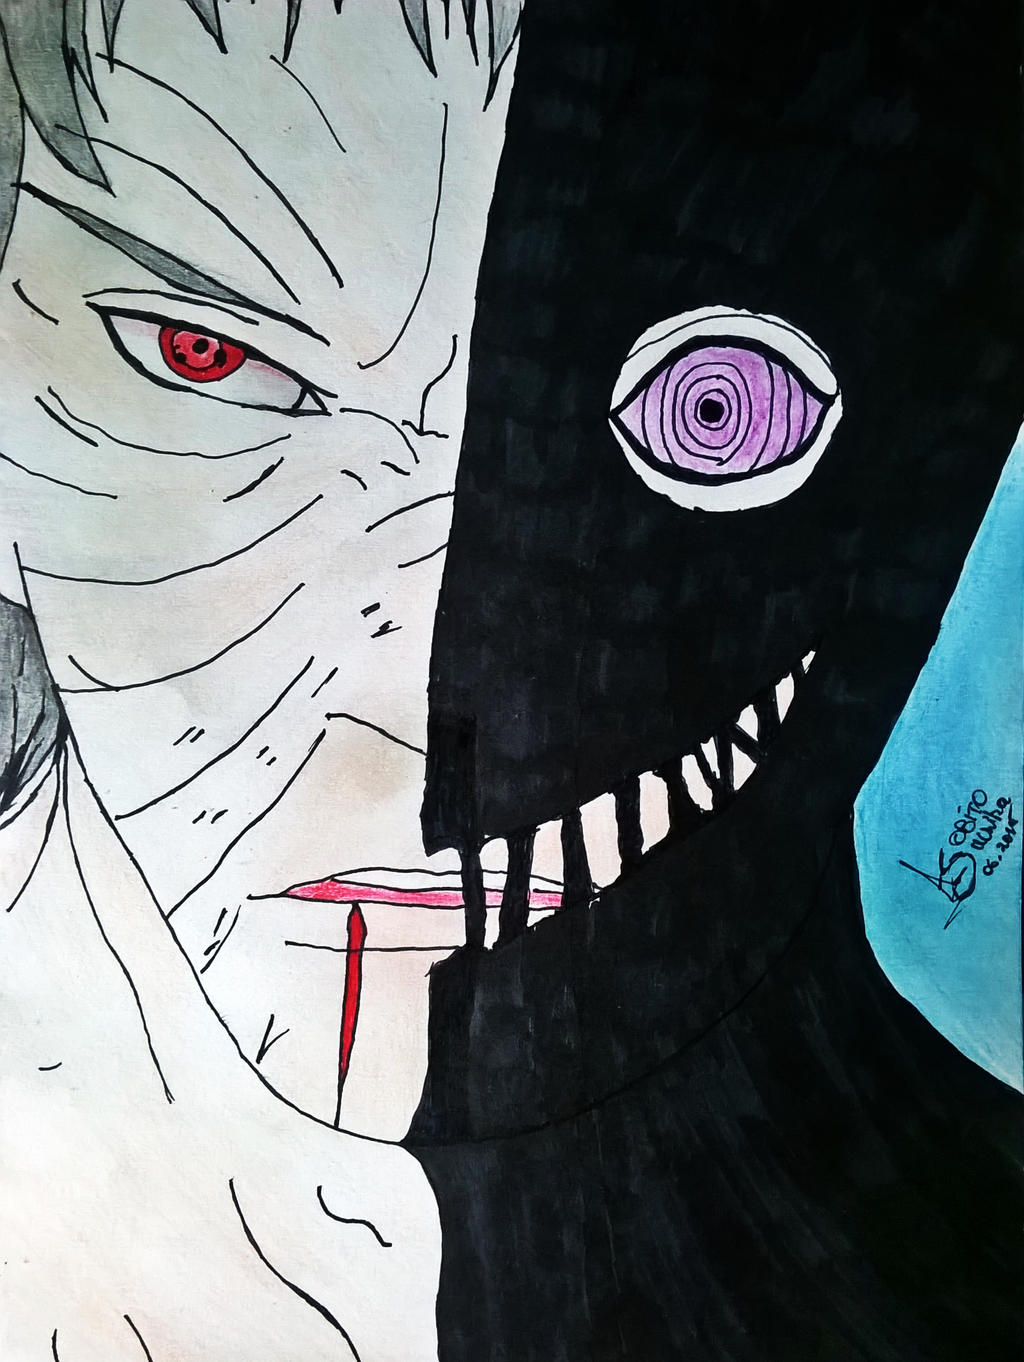 Naruto Shippuden - Obito Uchiha (Drawings by AS) by ...